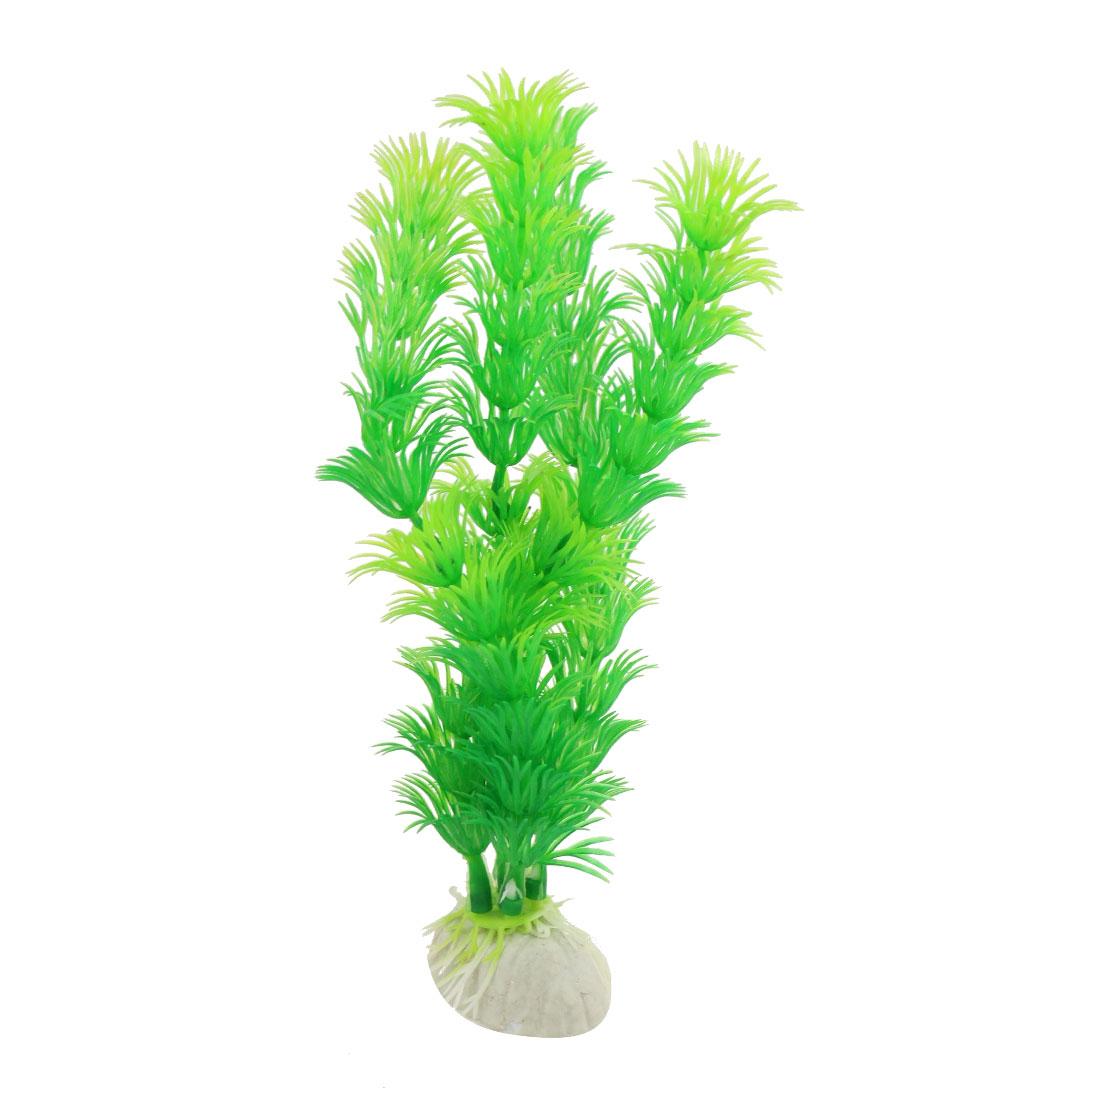 "6.7"" Green Plastic Artificial Grass Plant Decor for Aquarium Tank"